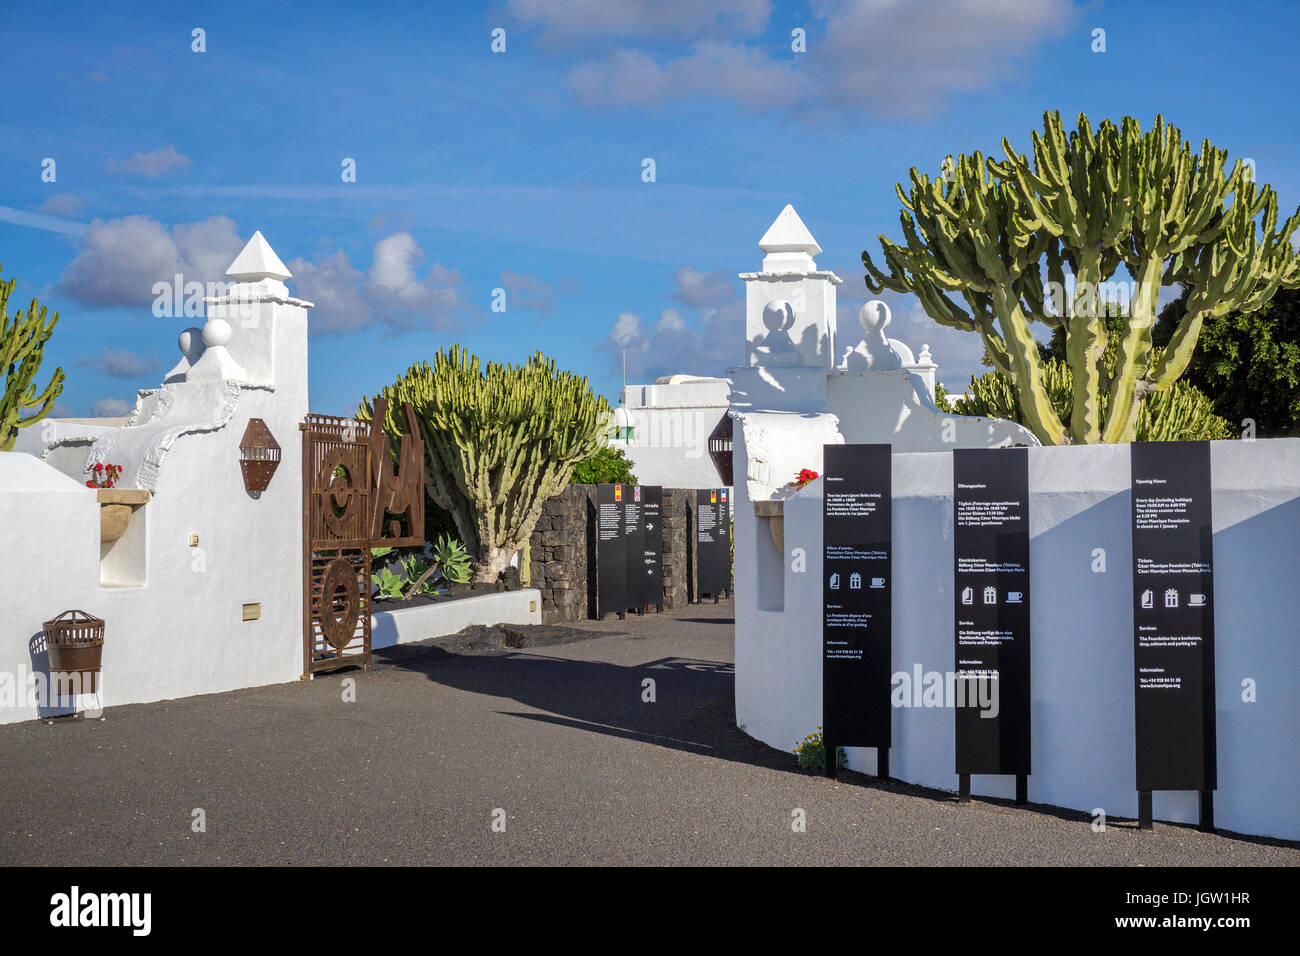 Eingang zur Fundacion Cesar Manrique, Taro de Tahiche, La Asomada, Lanzarote, Kanarische Inseln, Spanien, Europa Stockbild